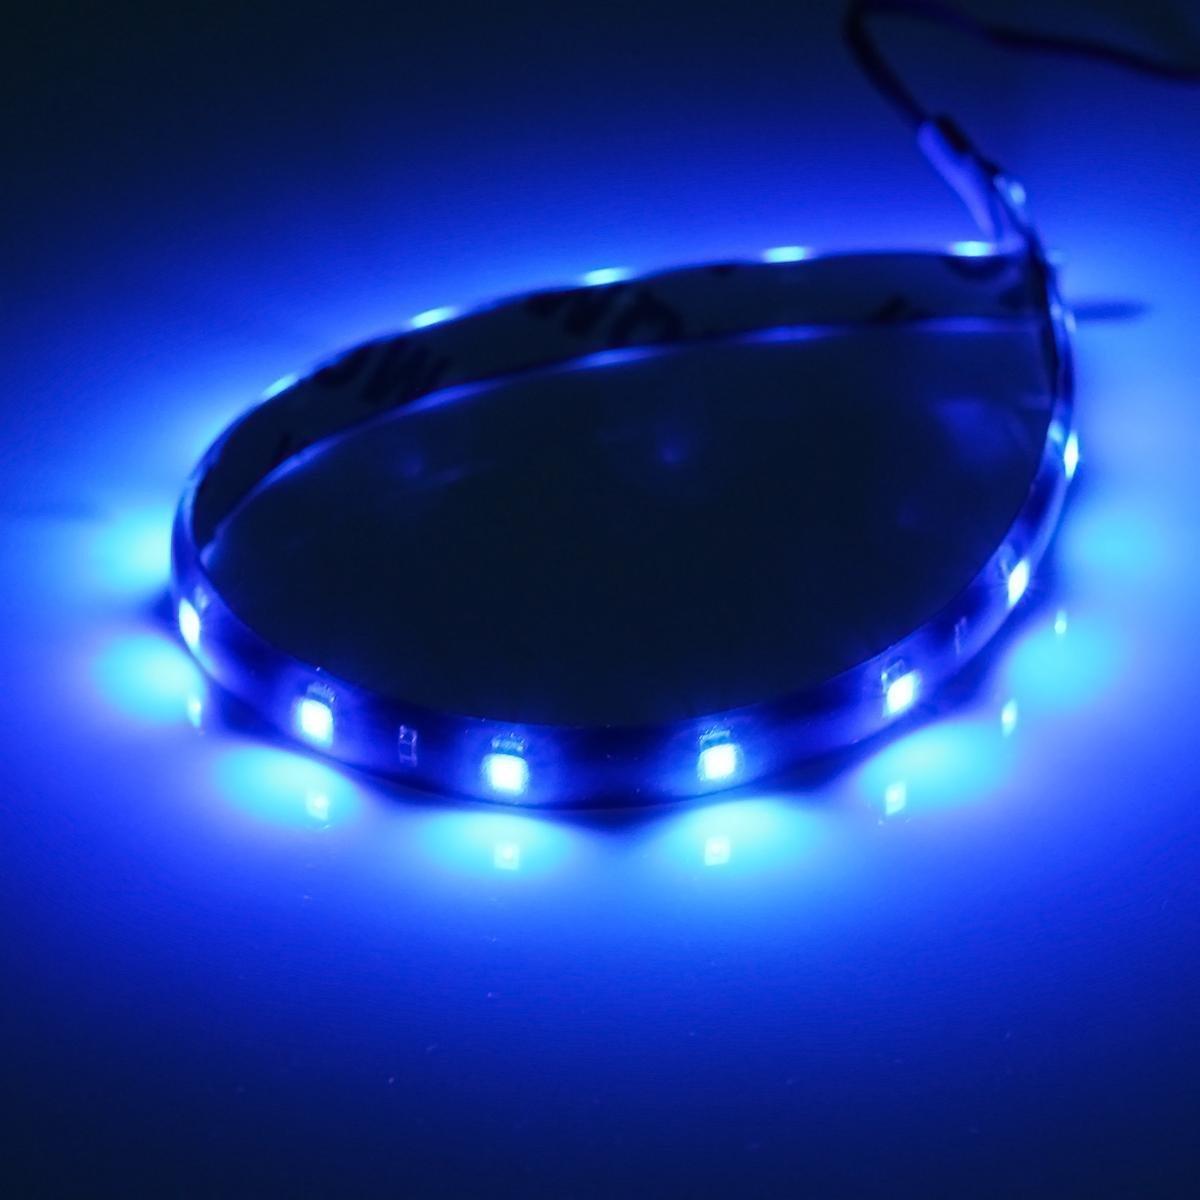 2pcs Car Auto Motorcycle Strip Lights 30CM Blue DC 12V 15 LED SMD  Waterproof Flexible Light Flexible Car LED Light Bulb In Headlight Bulbs  From Automobiles ...